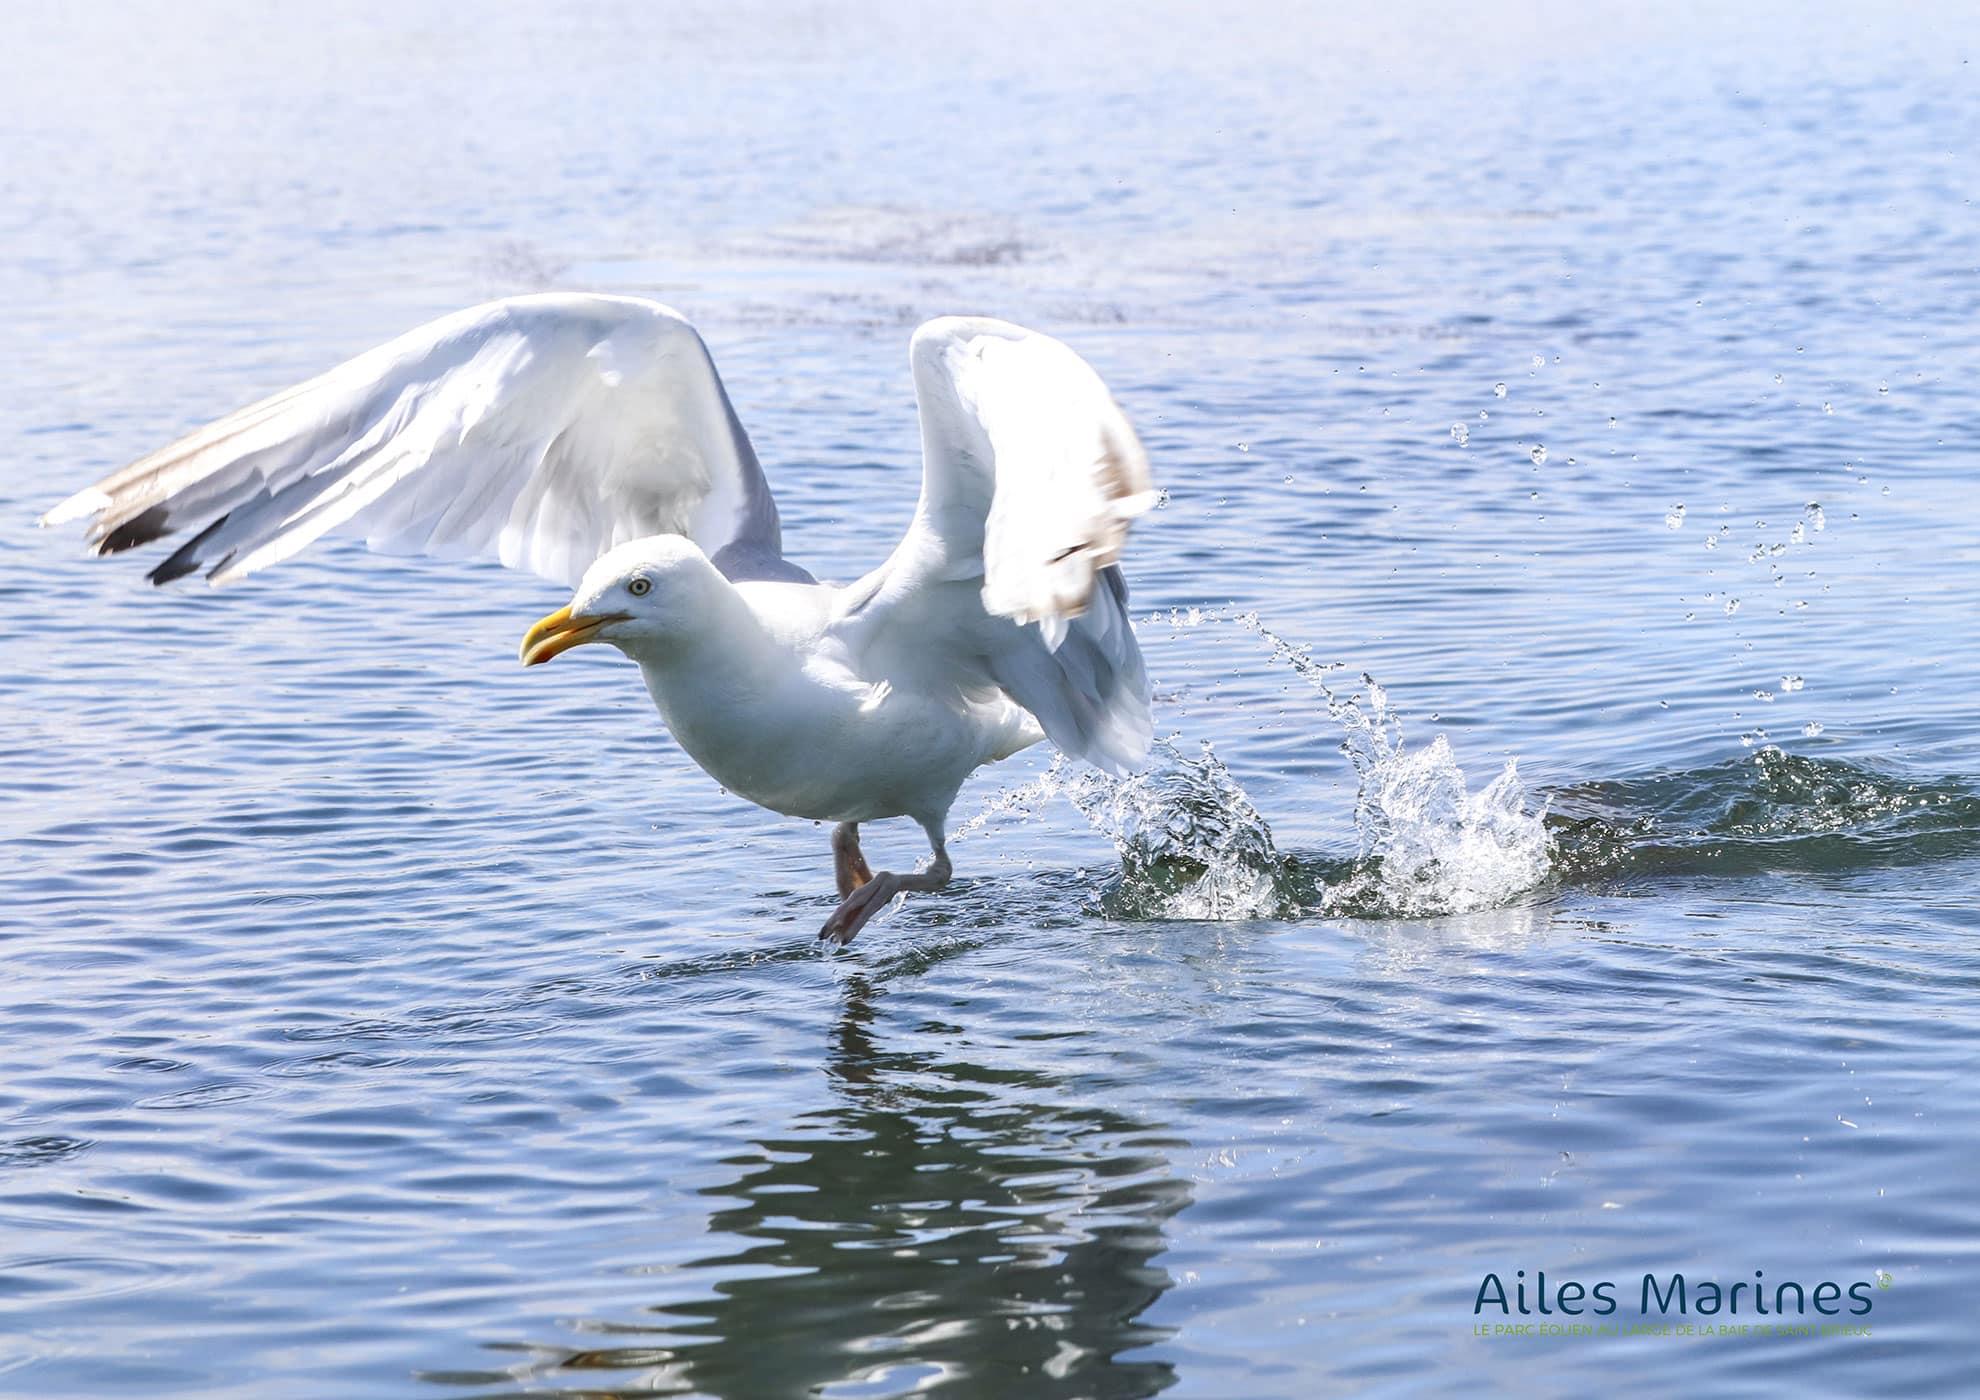 ailes-marines-goeland-adult-silver-flying